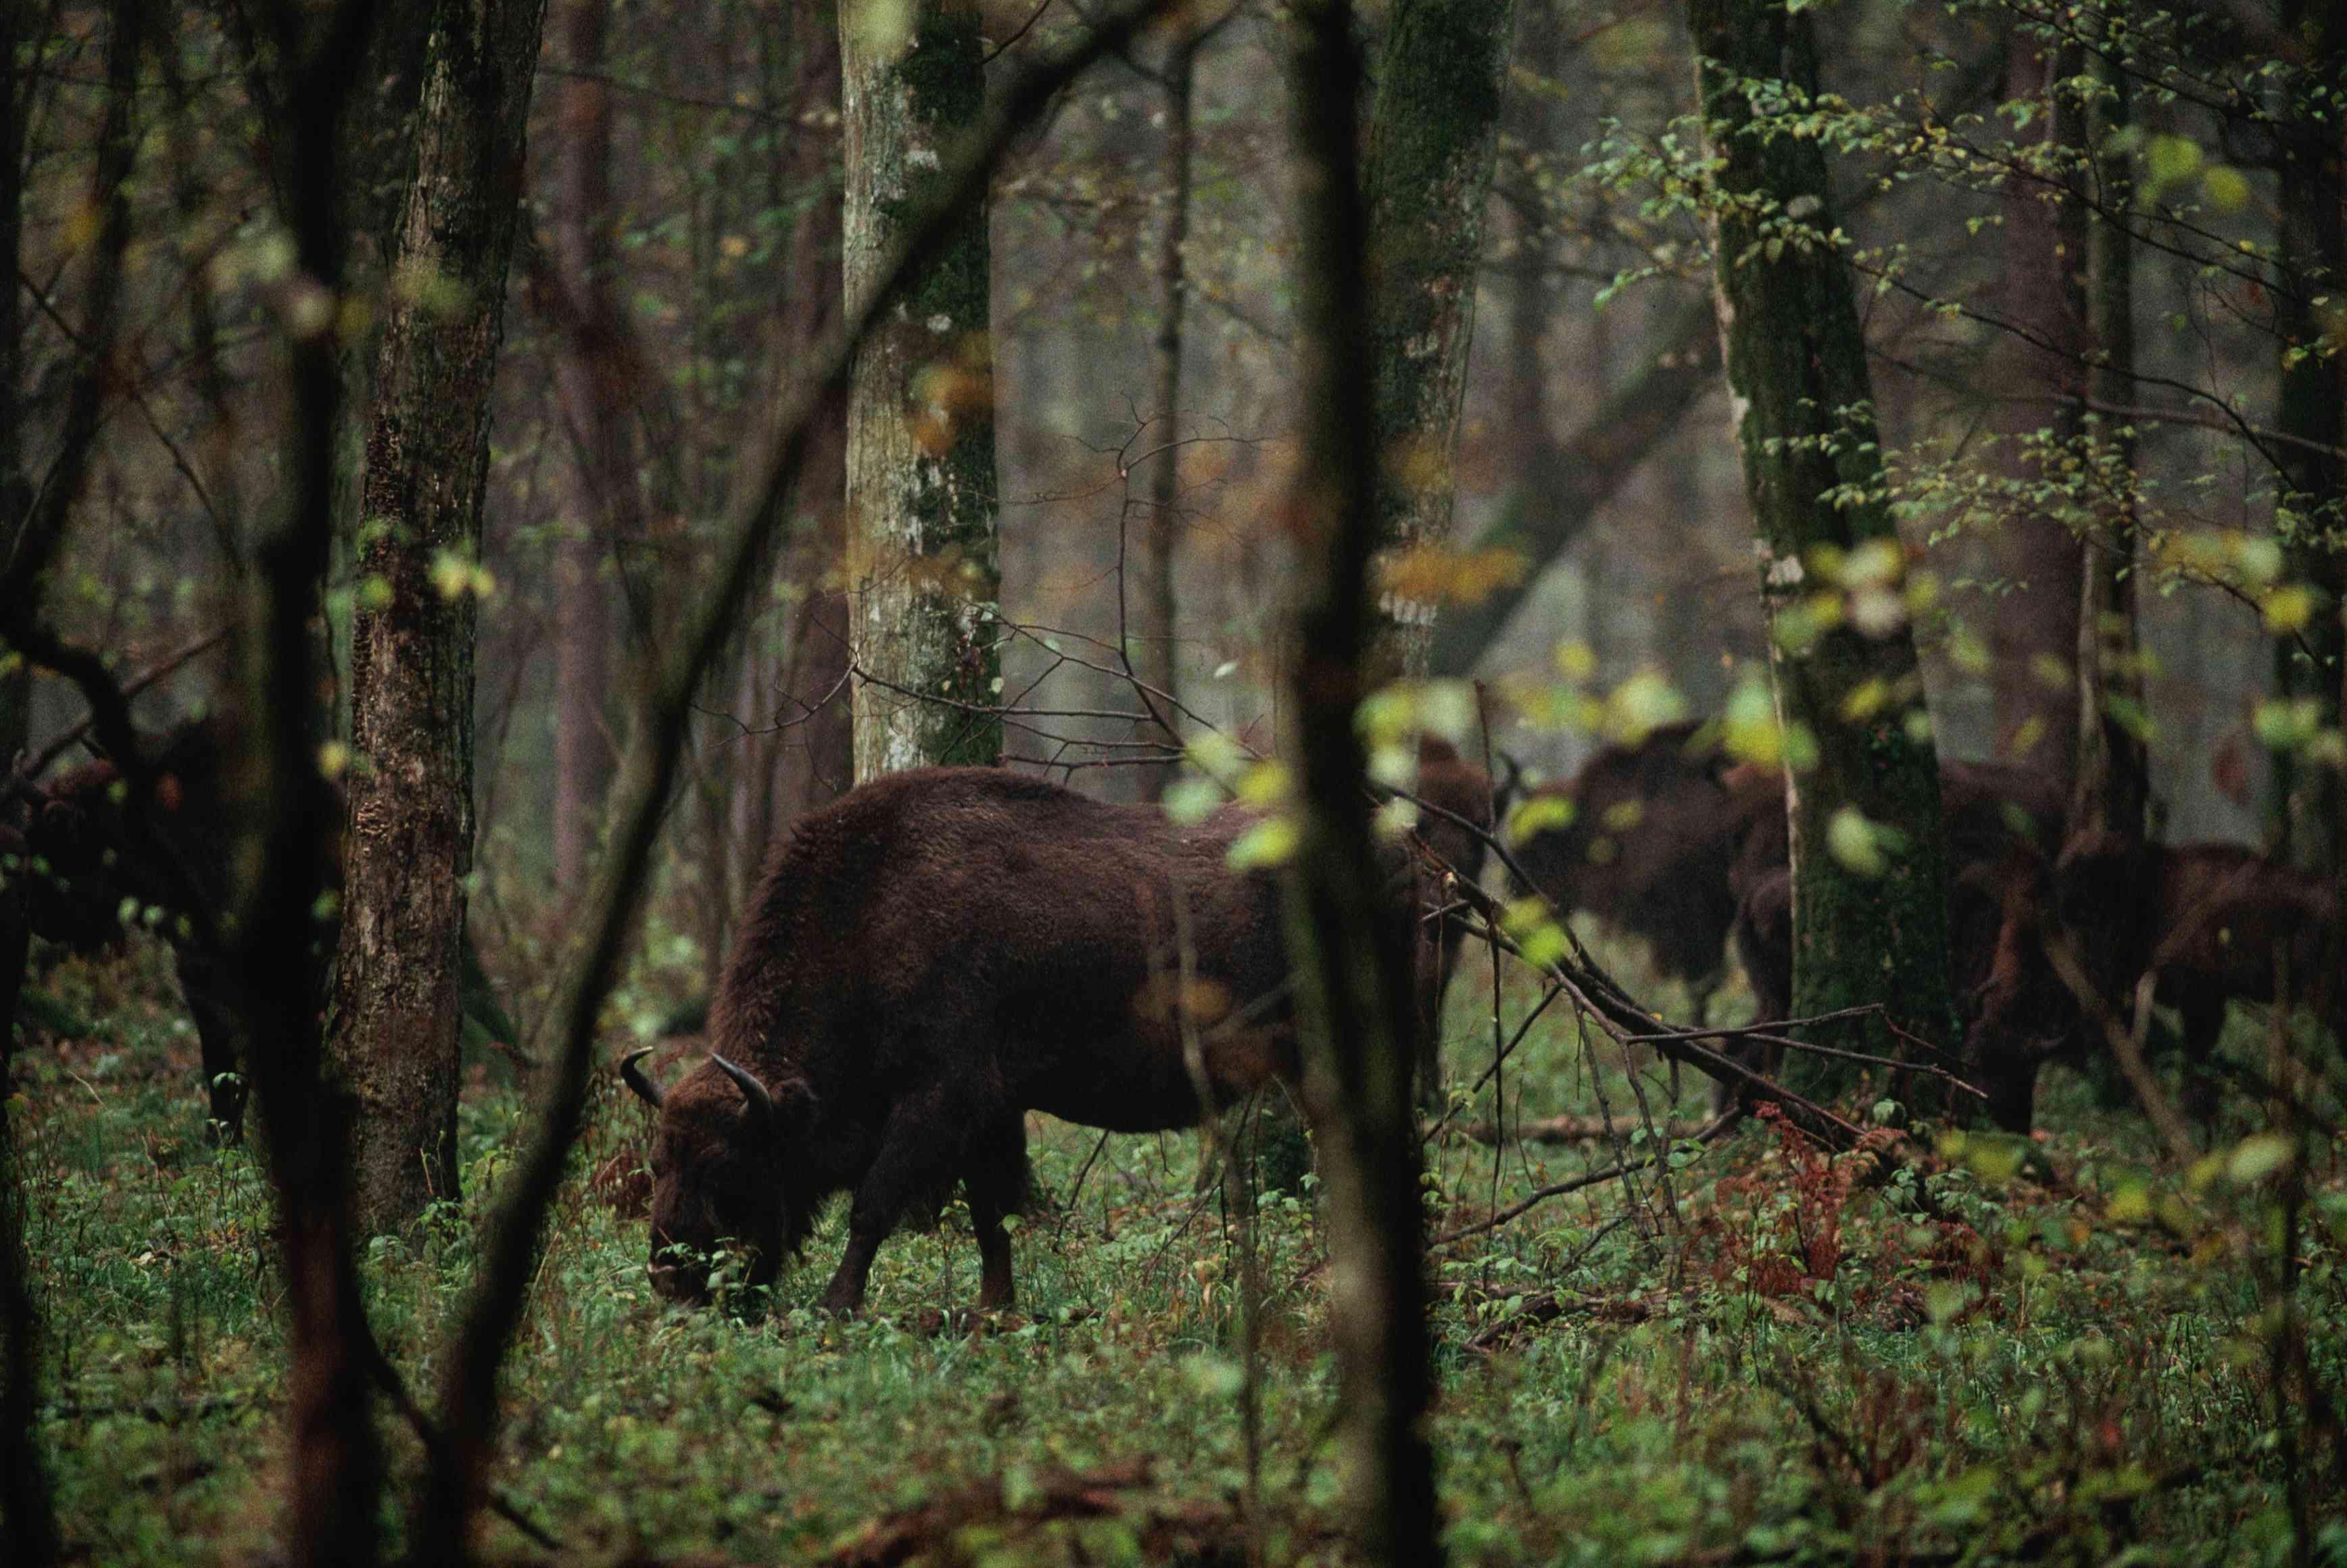 multiple dark brown European bison grazing, viewed through trees